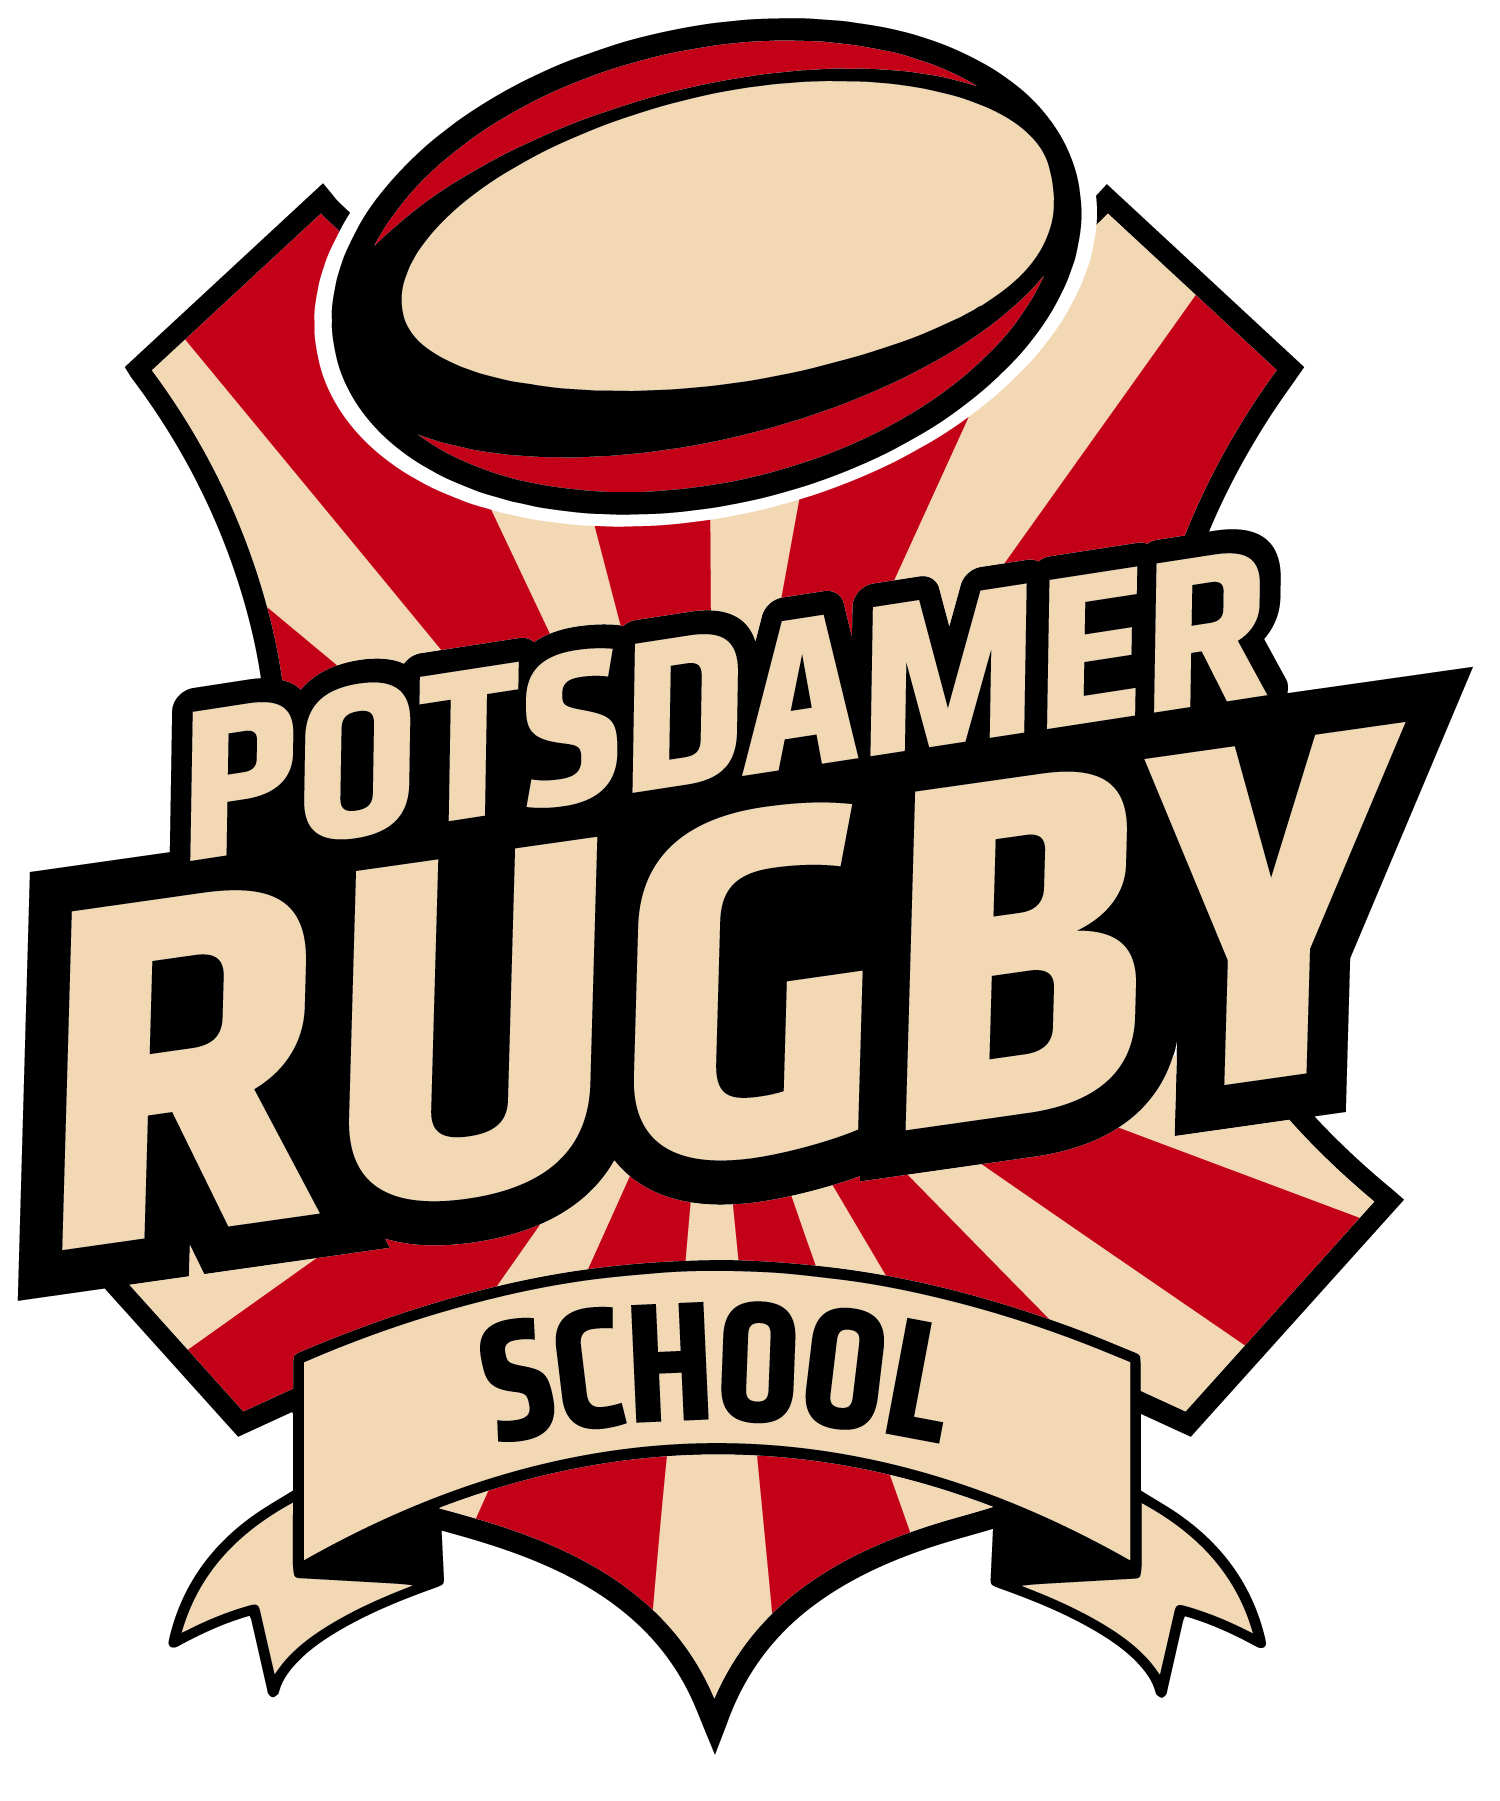 Potsdamer Rugby School